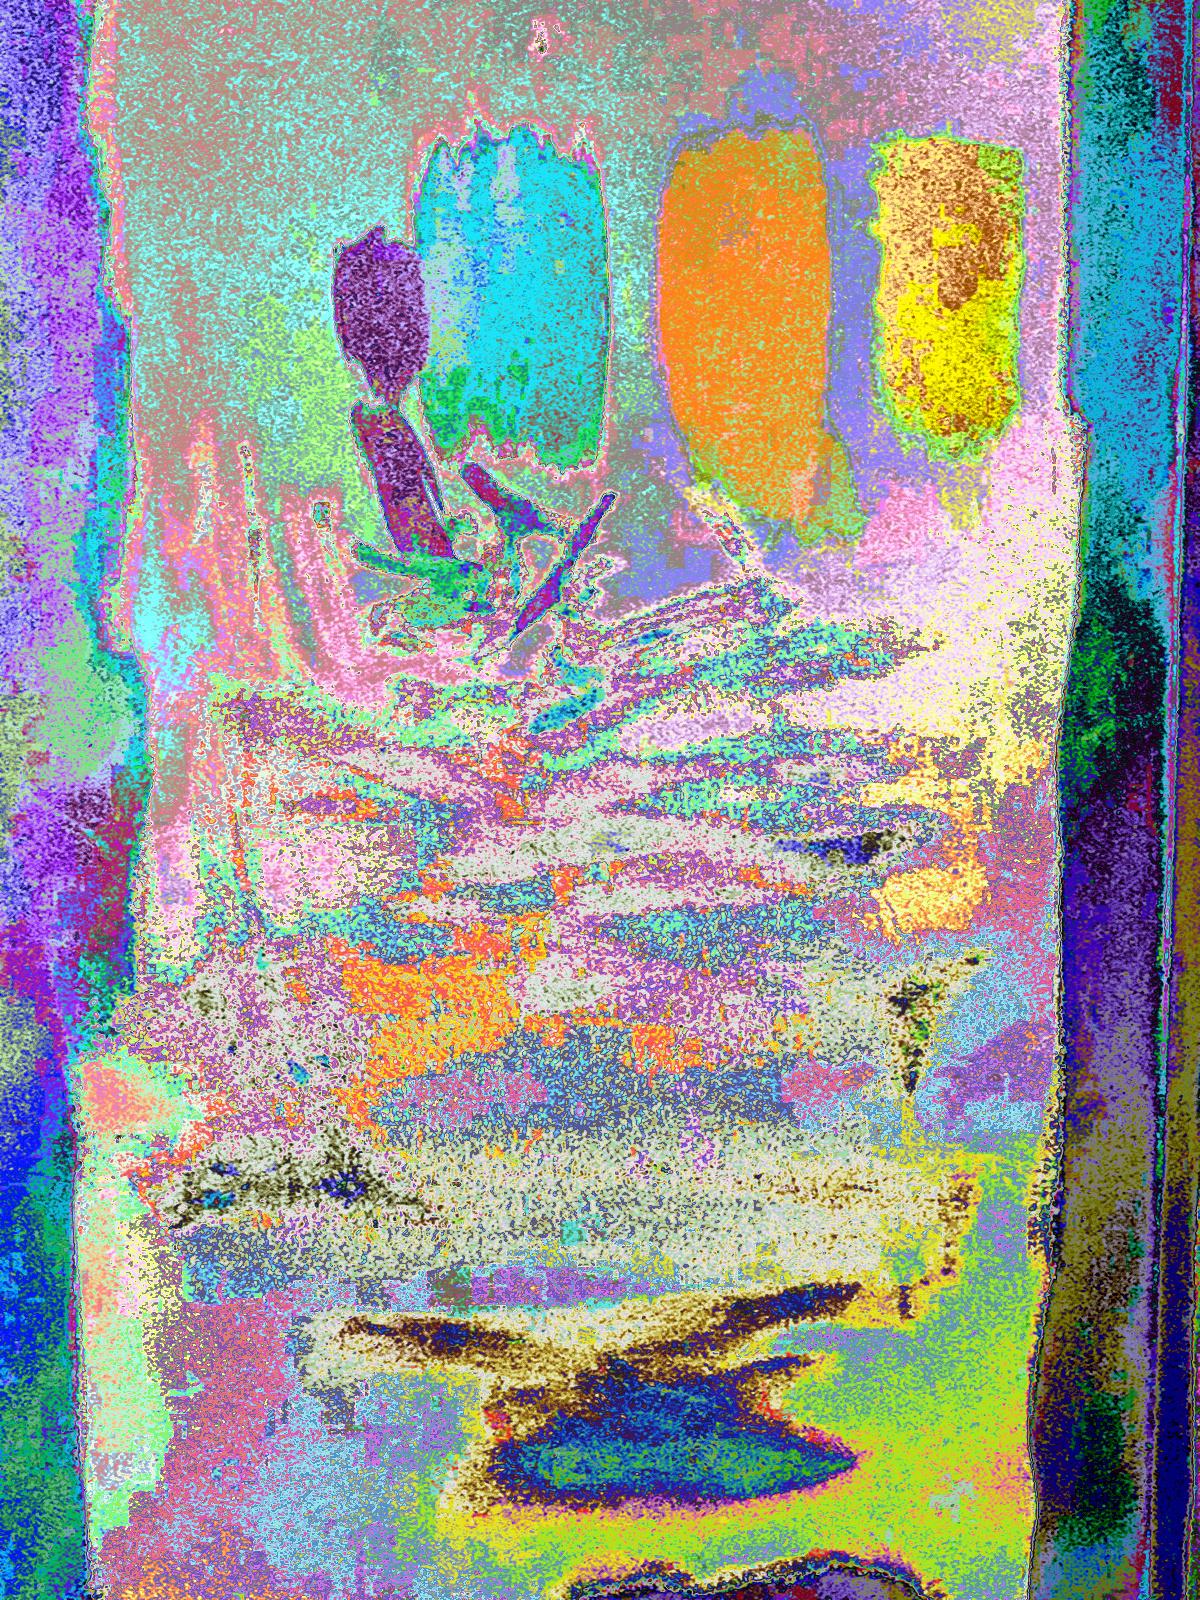 AbstractExpressionism-NancysStudy3b-levl-hue3-curv83.jpg